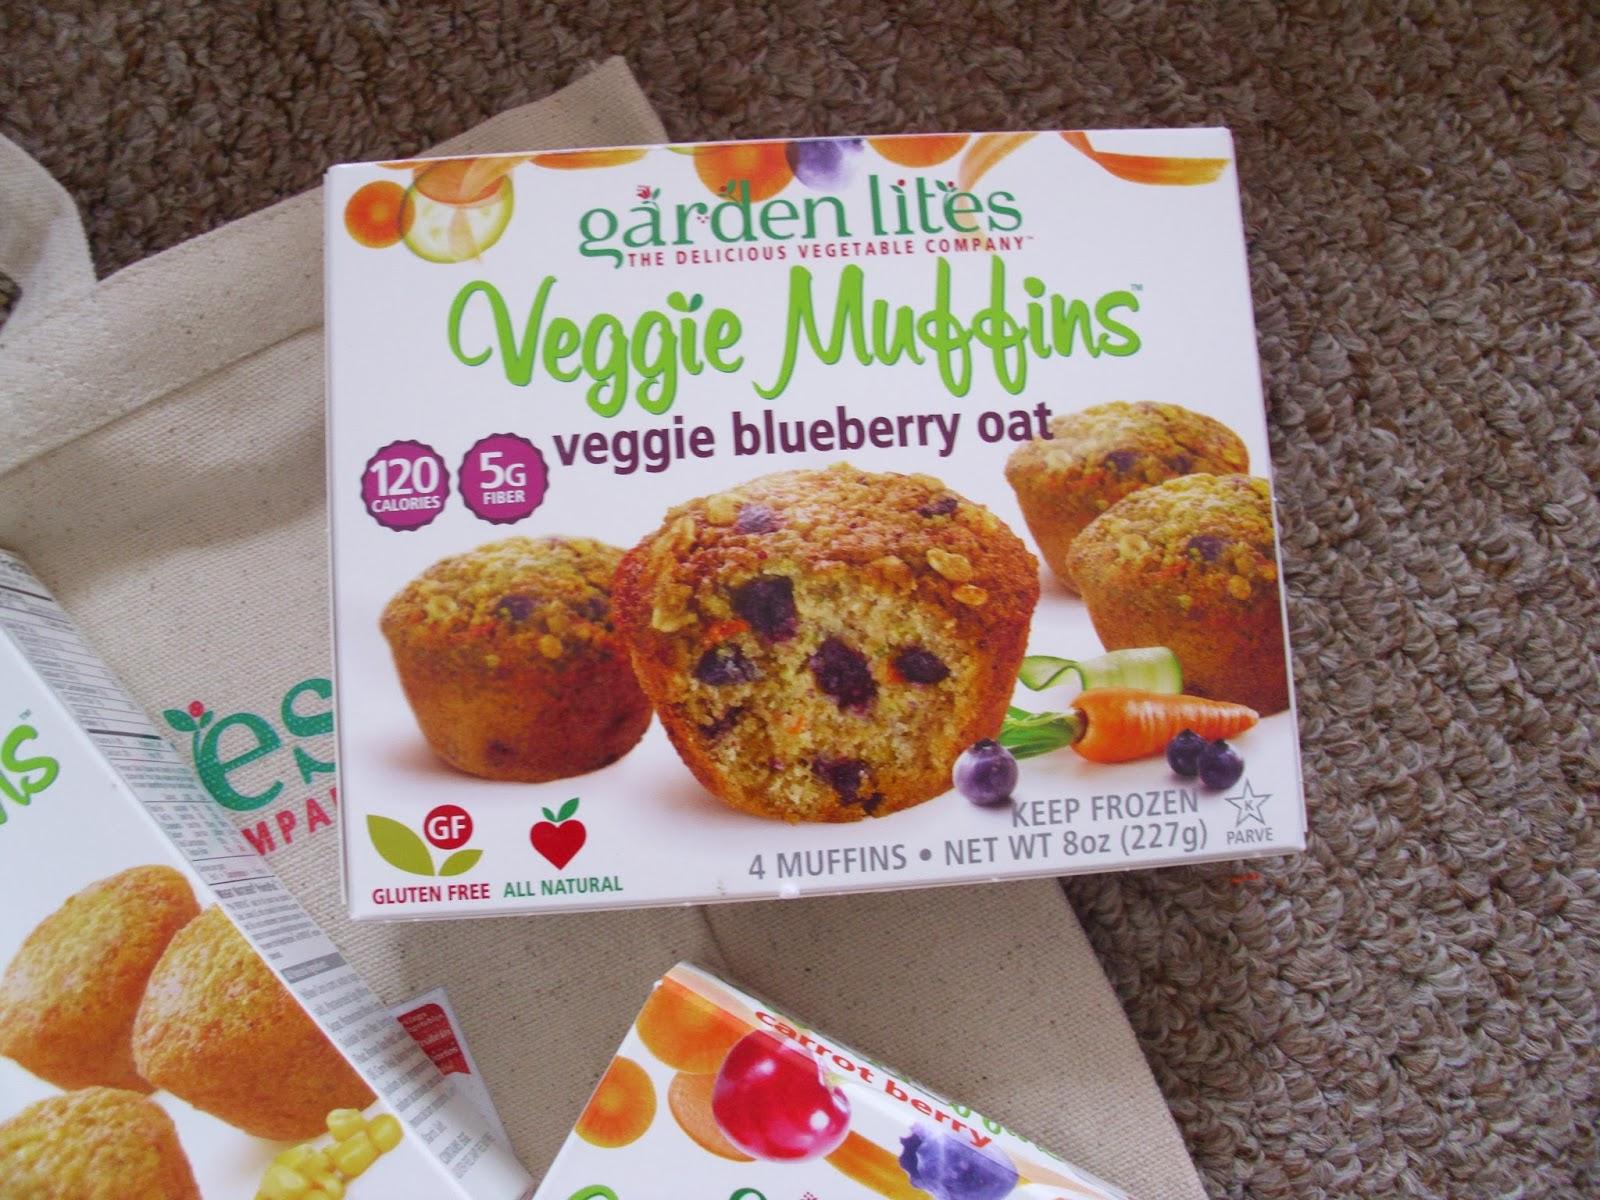 Review giveaway garden lites veggie muffins living - Garden lites blueberry oat muffins ...